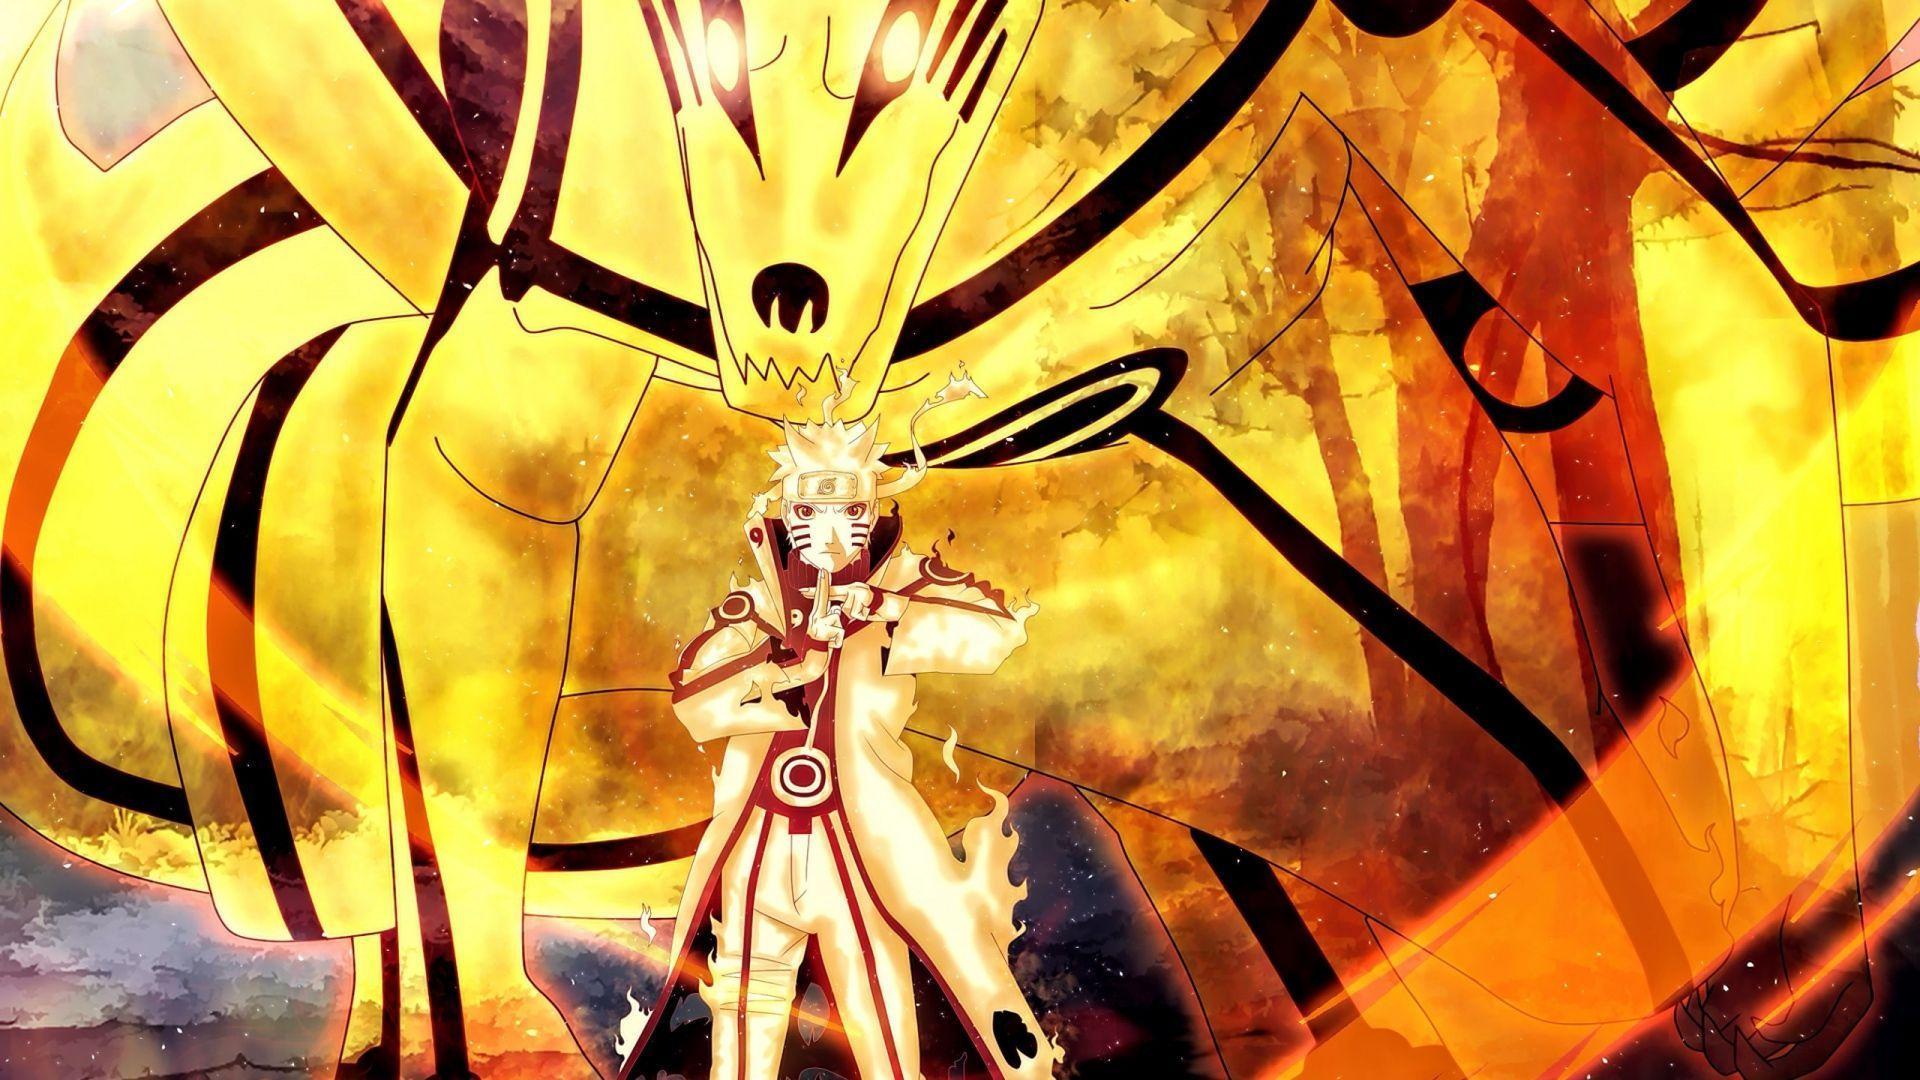 Naruto Shippuden Wallpapers HD 1920x1080 - Wallpaper Cave